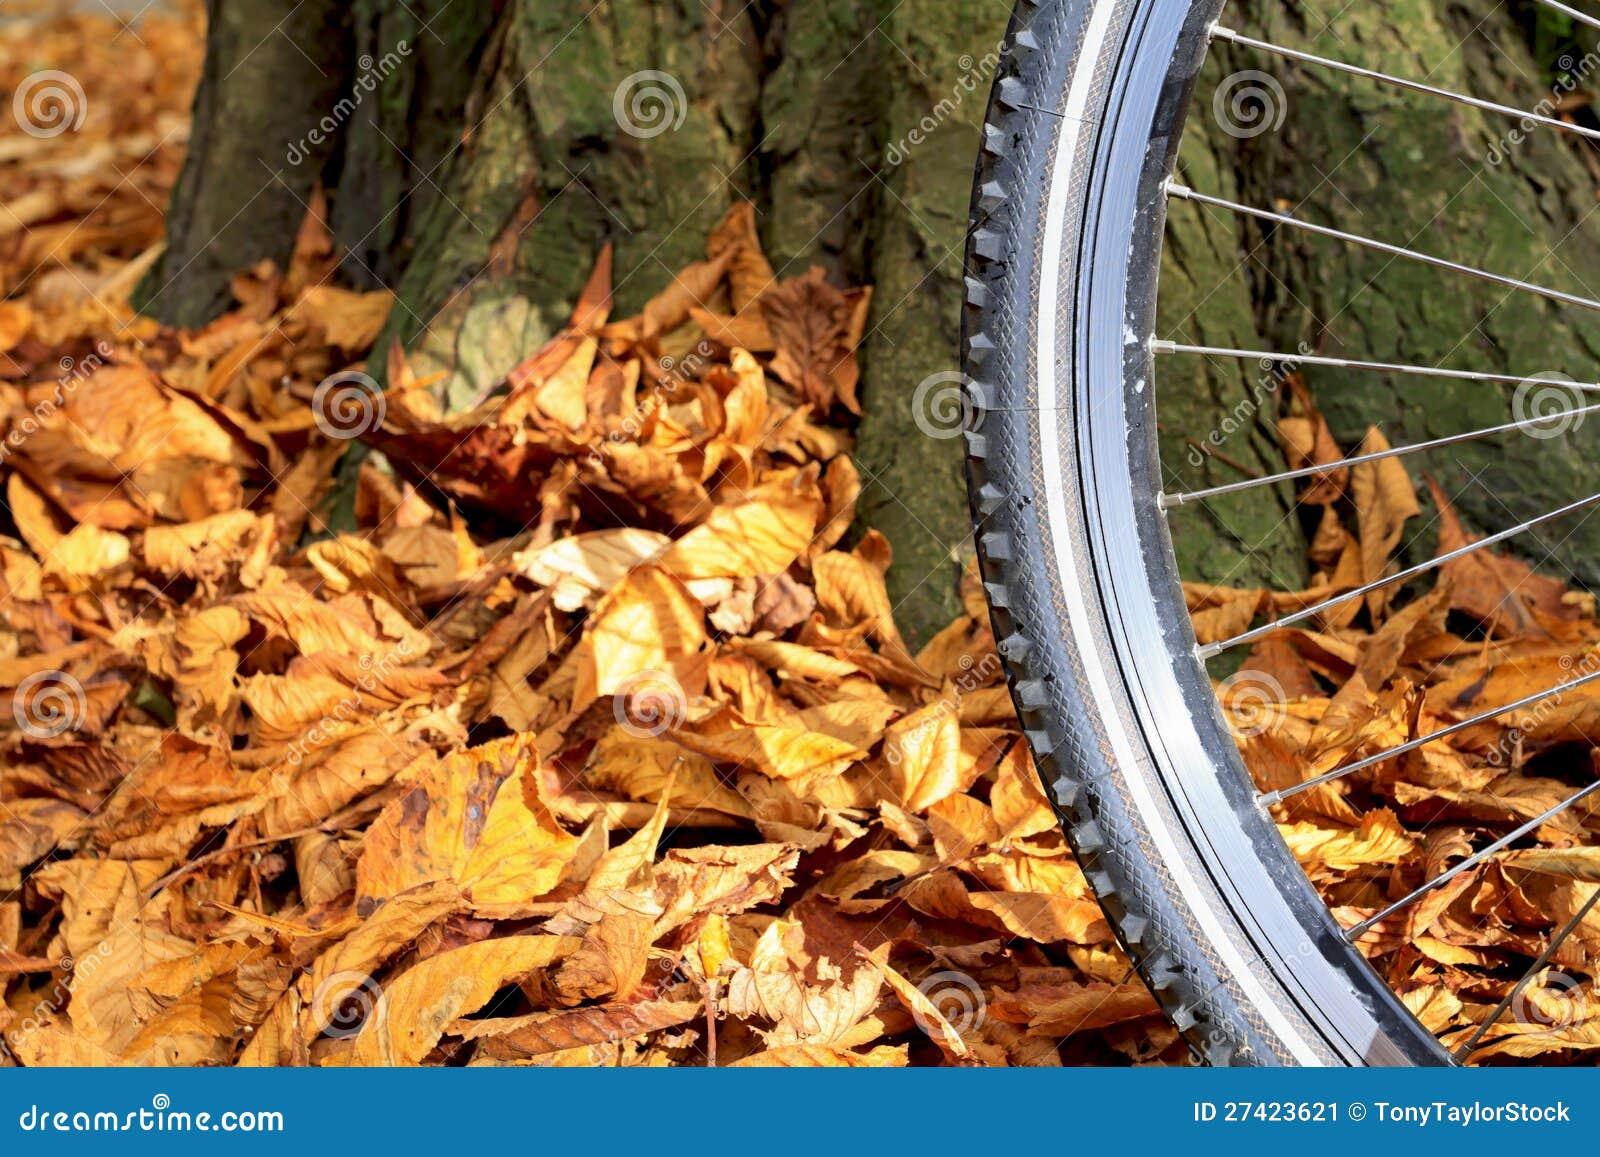 Mountain bike wheel and tire tread